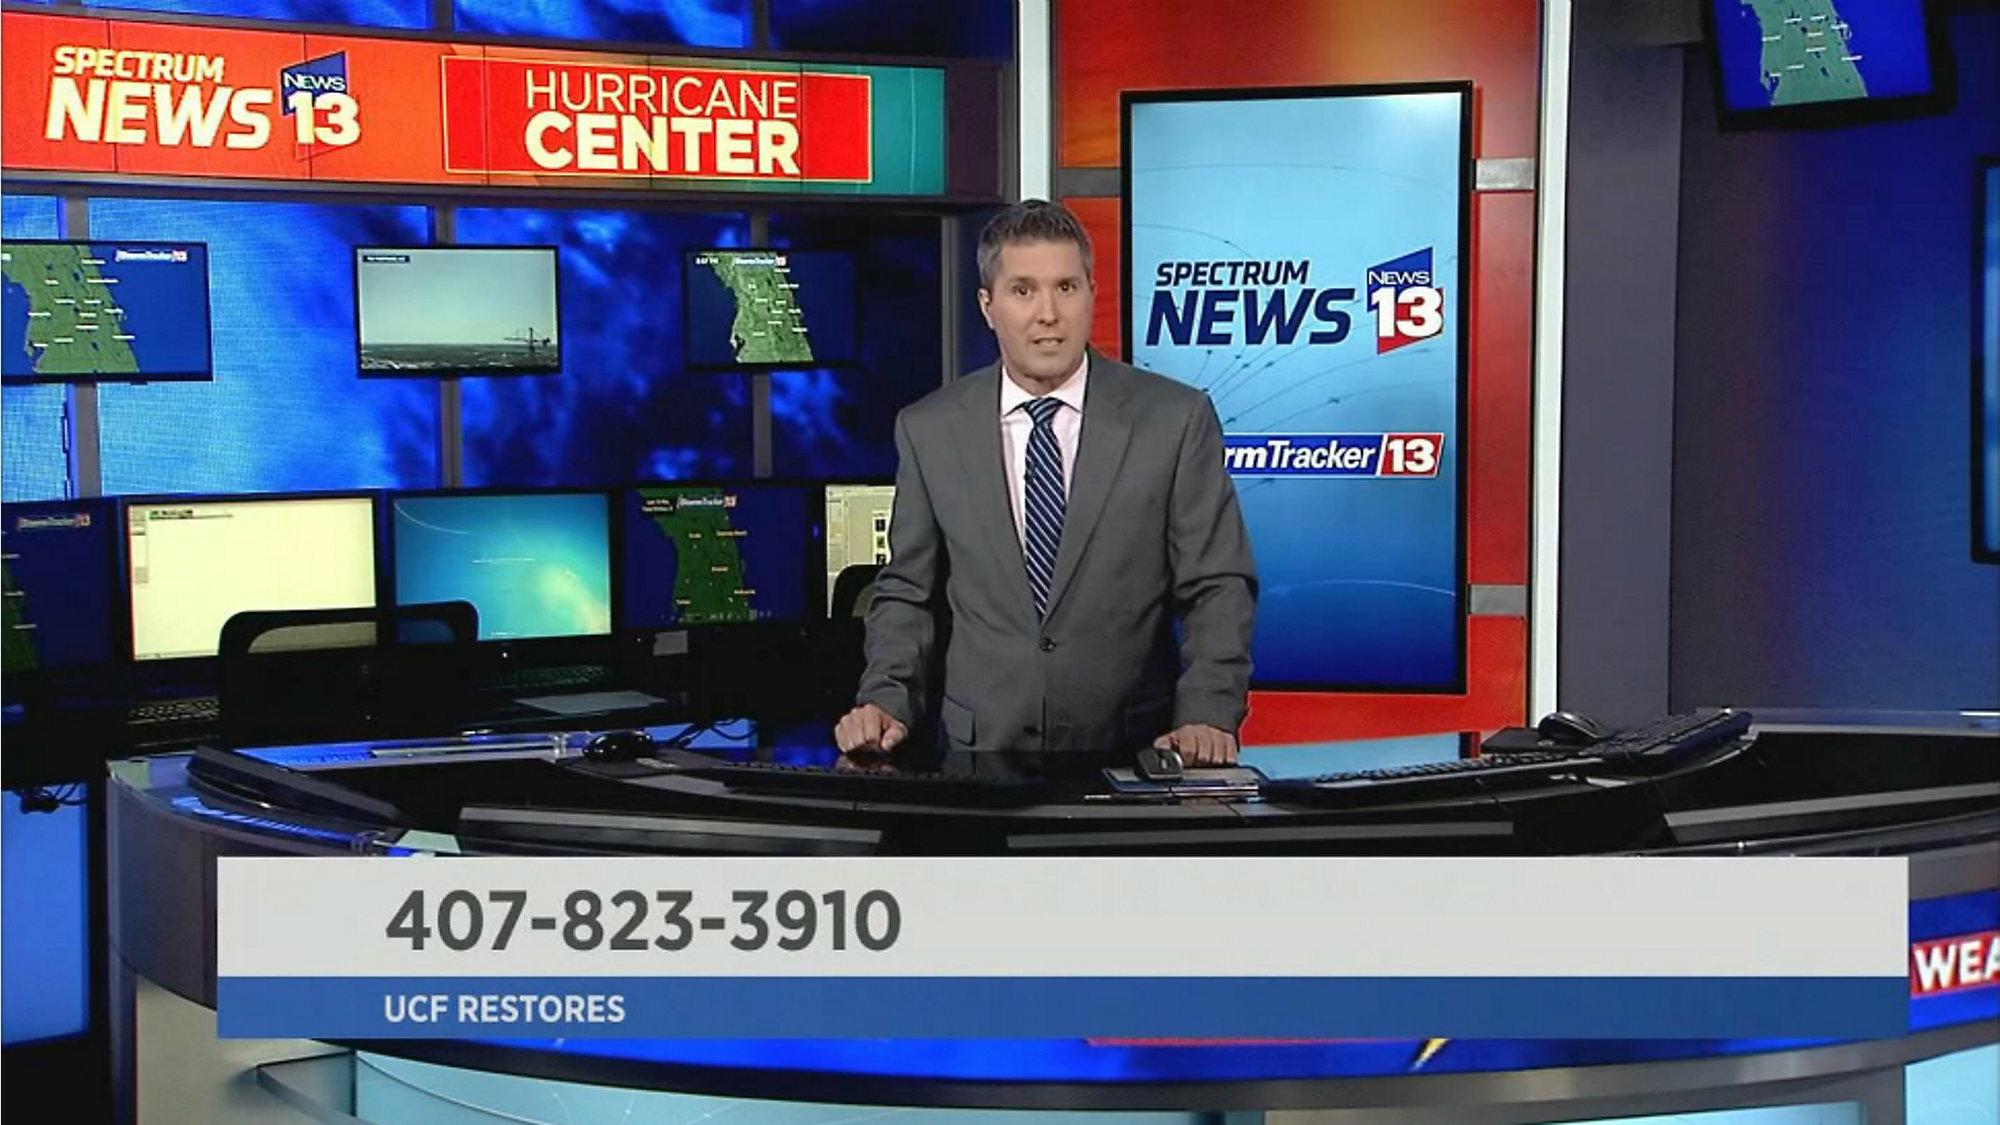 Storm Season | Hurricane Information, StormTracker 13, Safety Tips